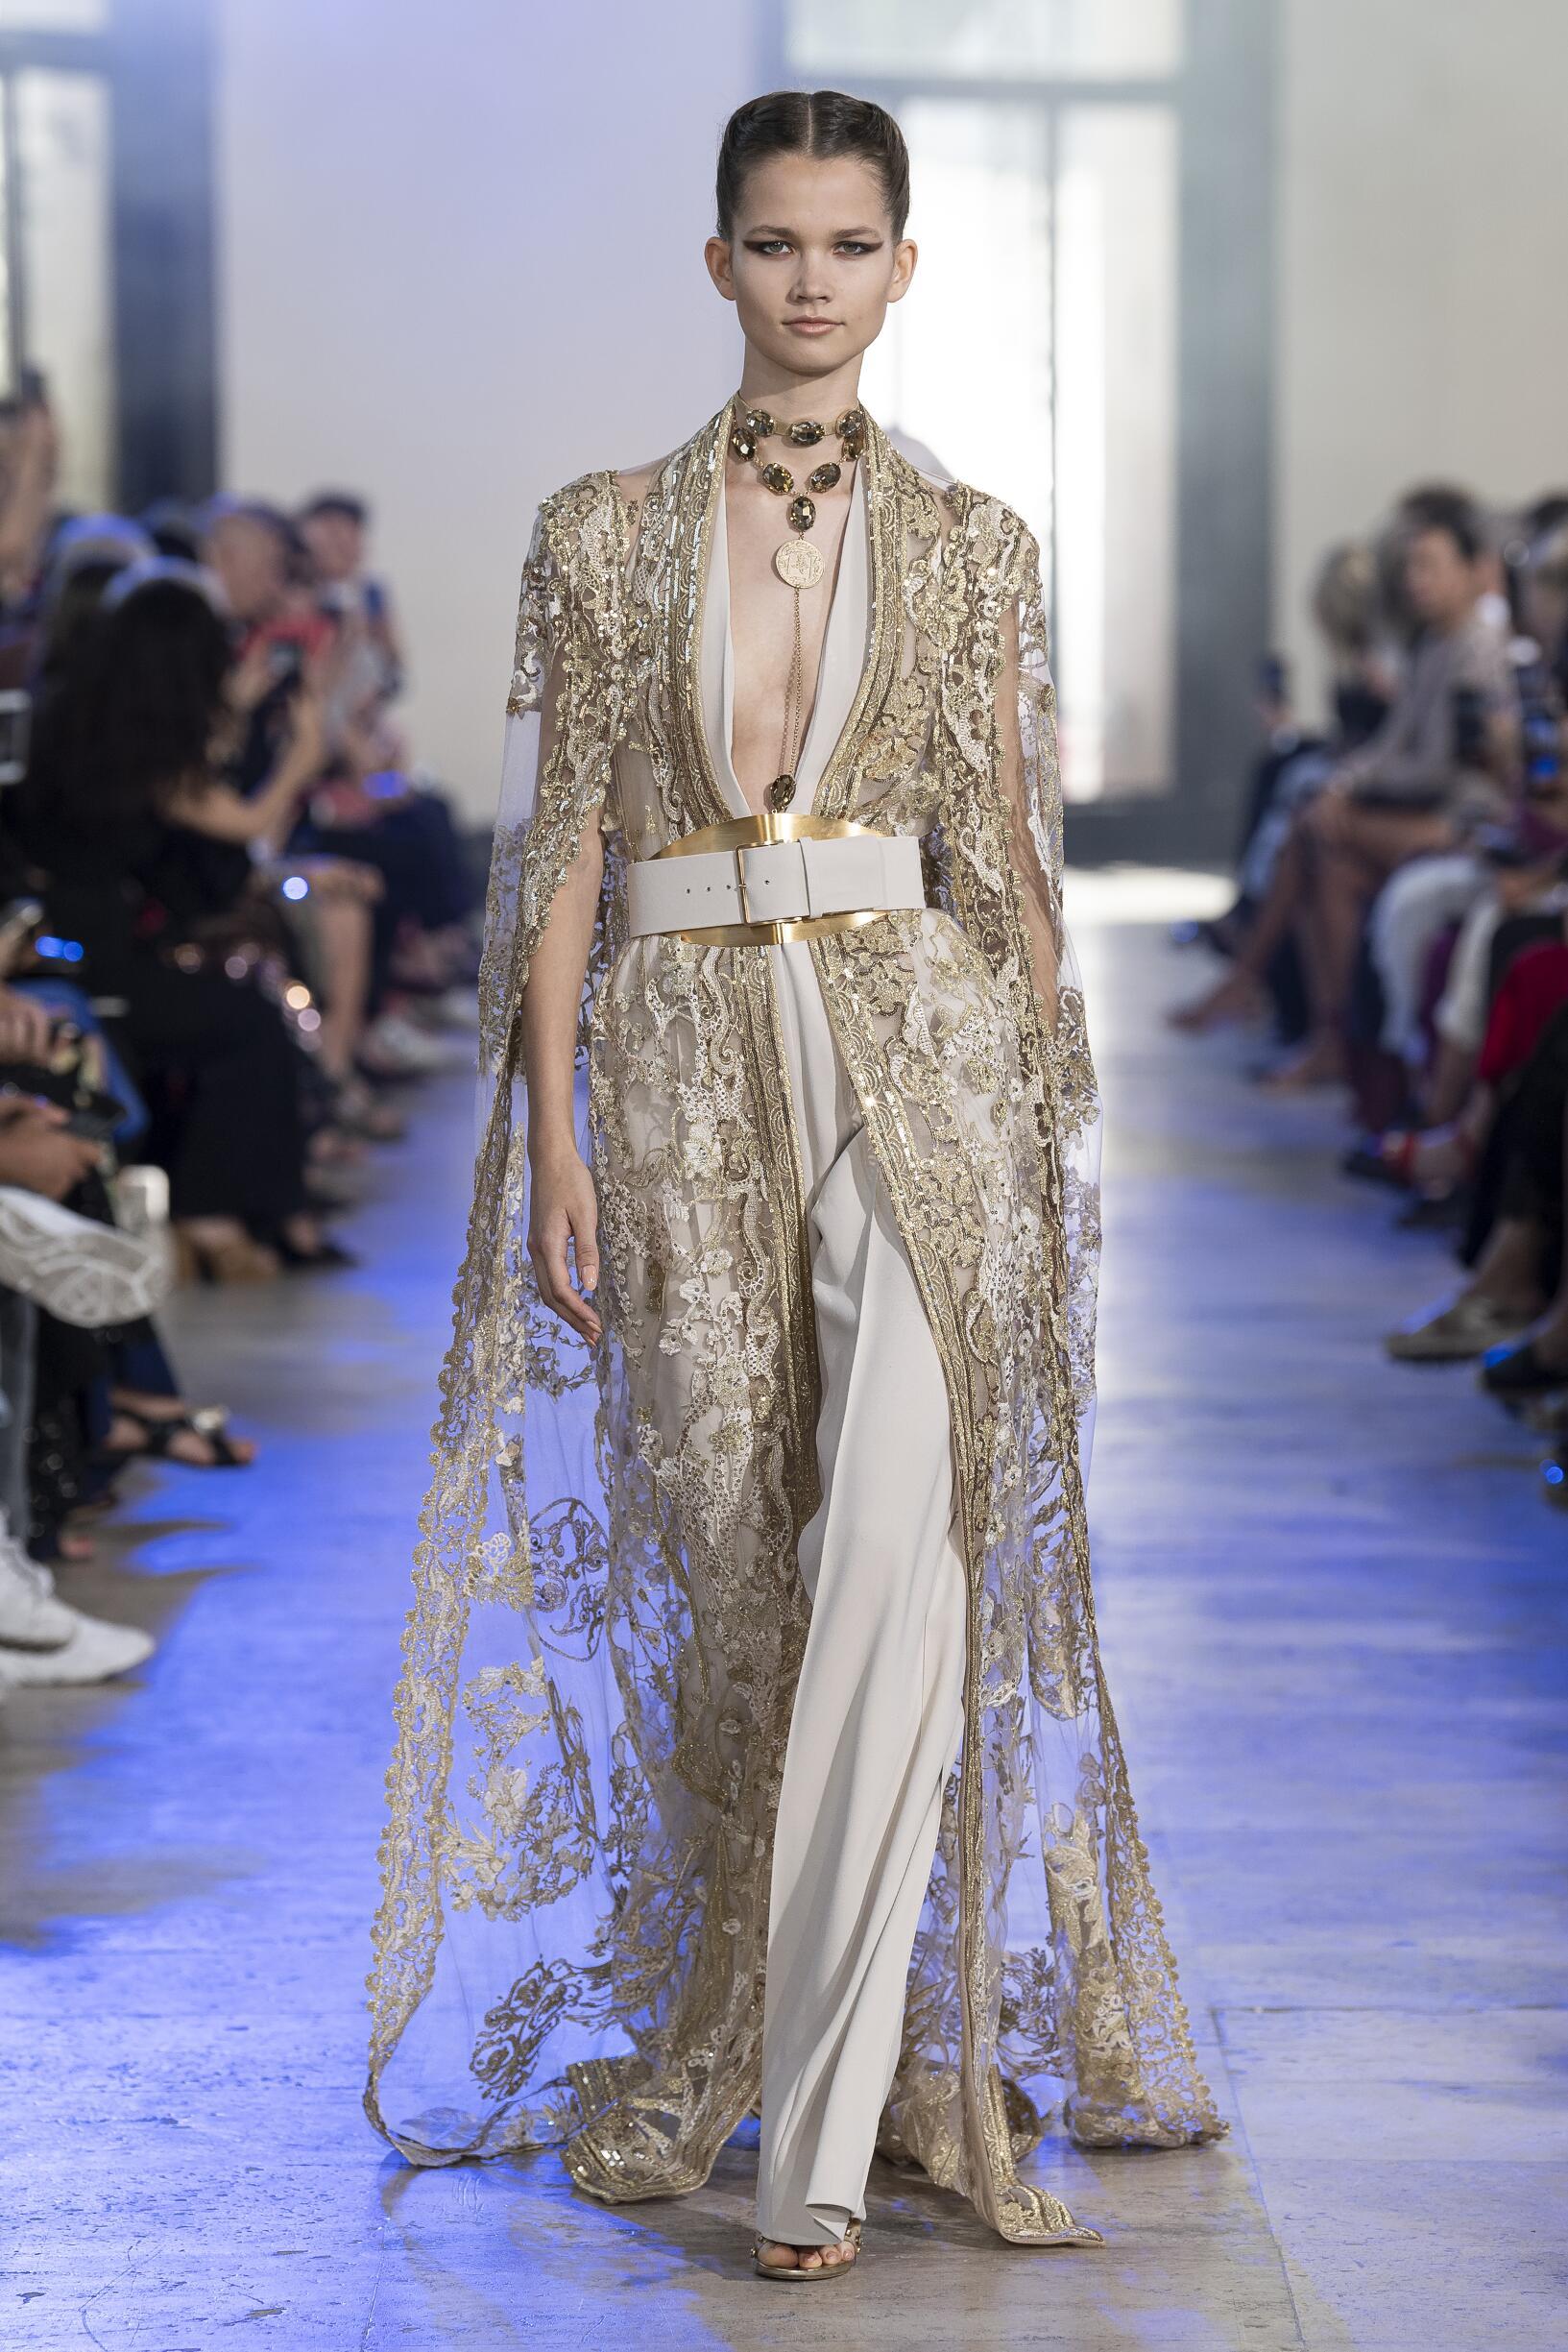 Catwalk Elie Saab Haute Couture Women Fashion Show Winter 2019-2020